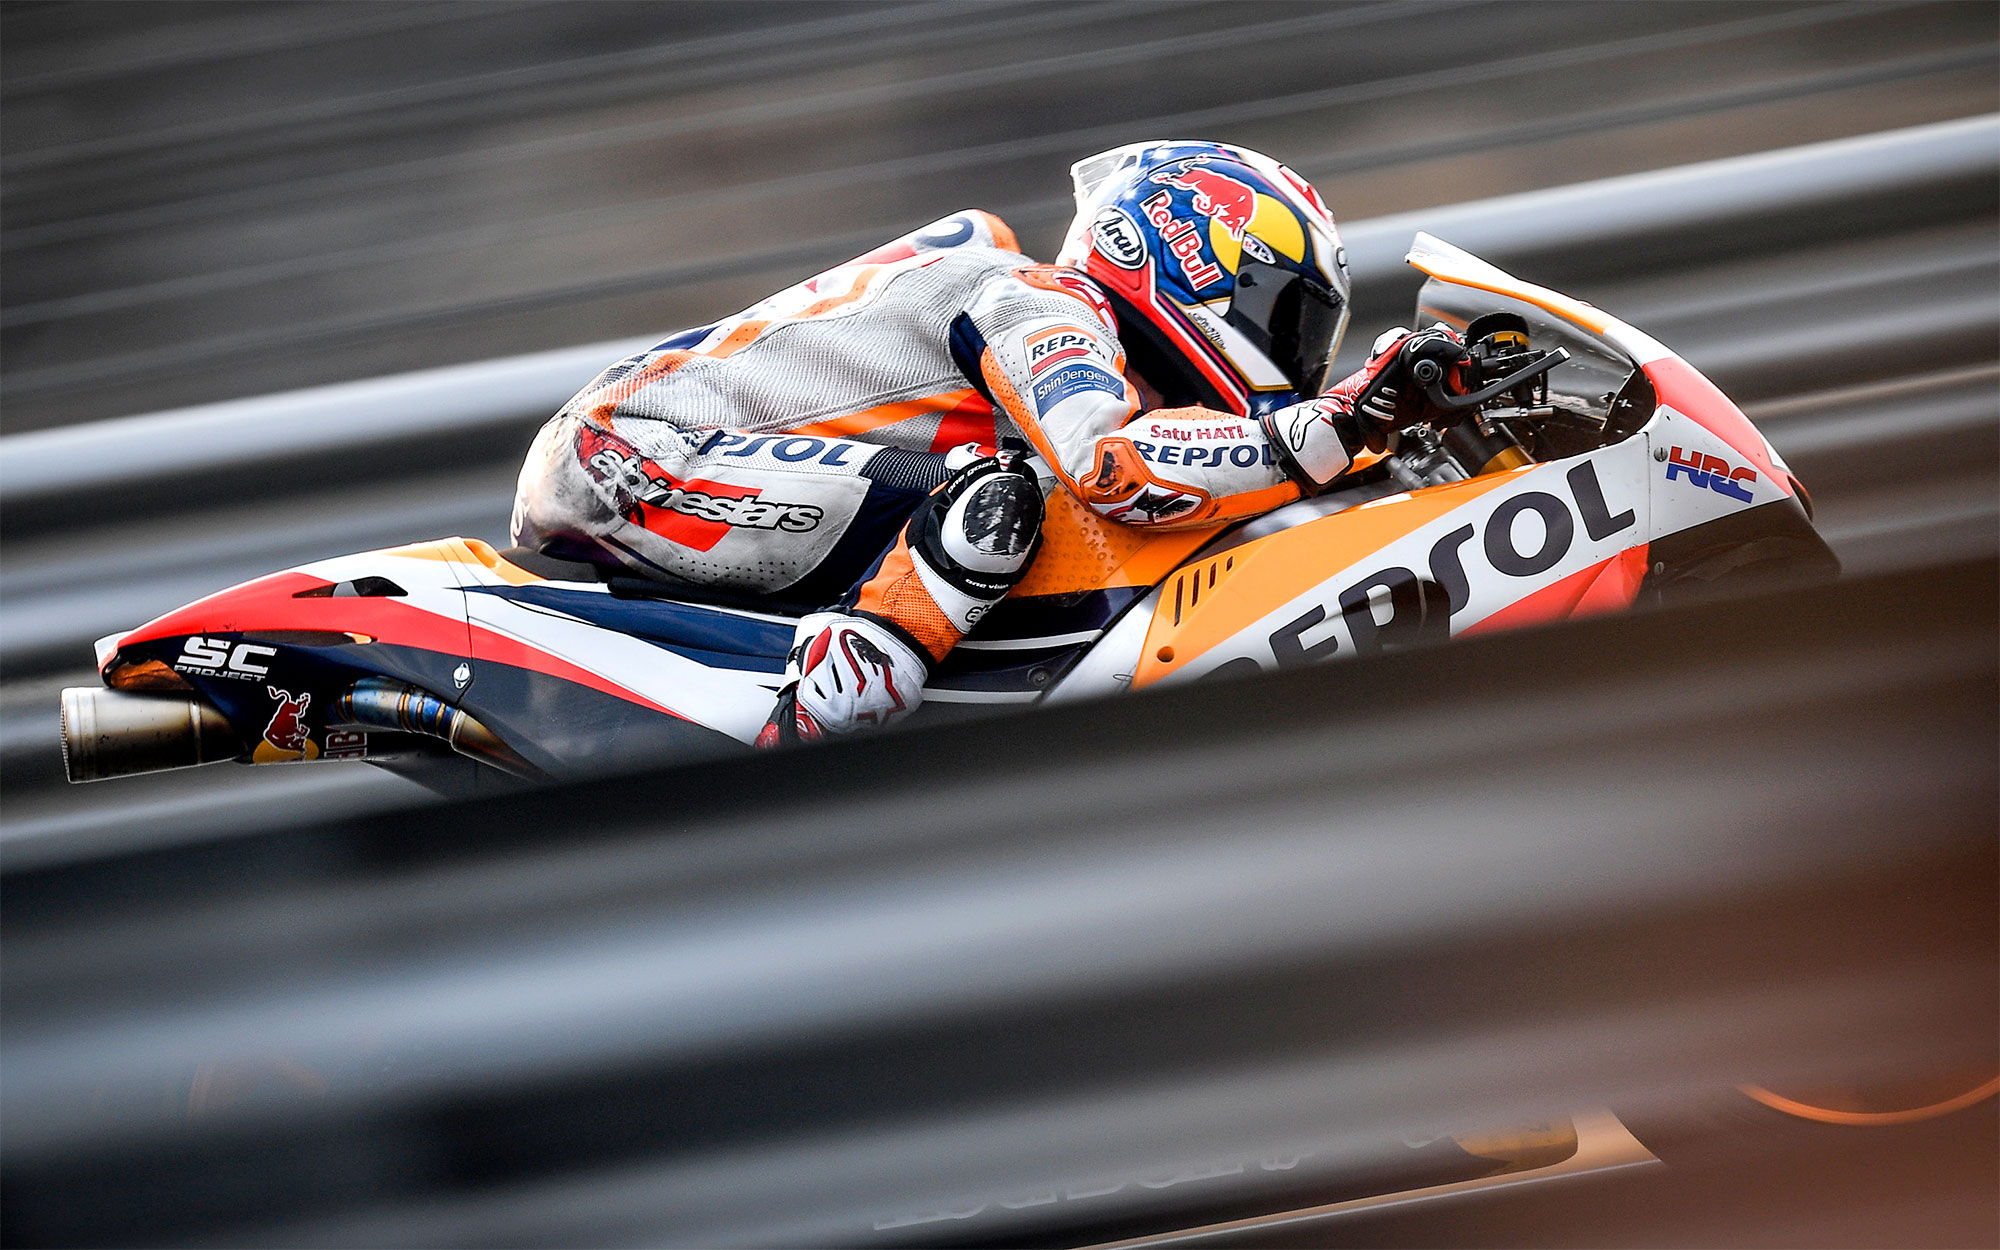 MotoGP 2018: Dani Pedrosa acaba en lo alto y Johann Zarco evita el triplete de Honda